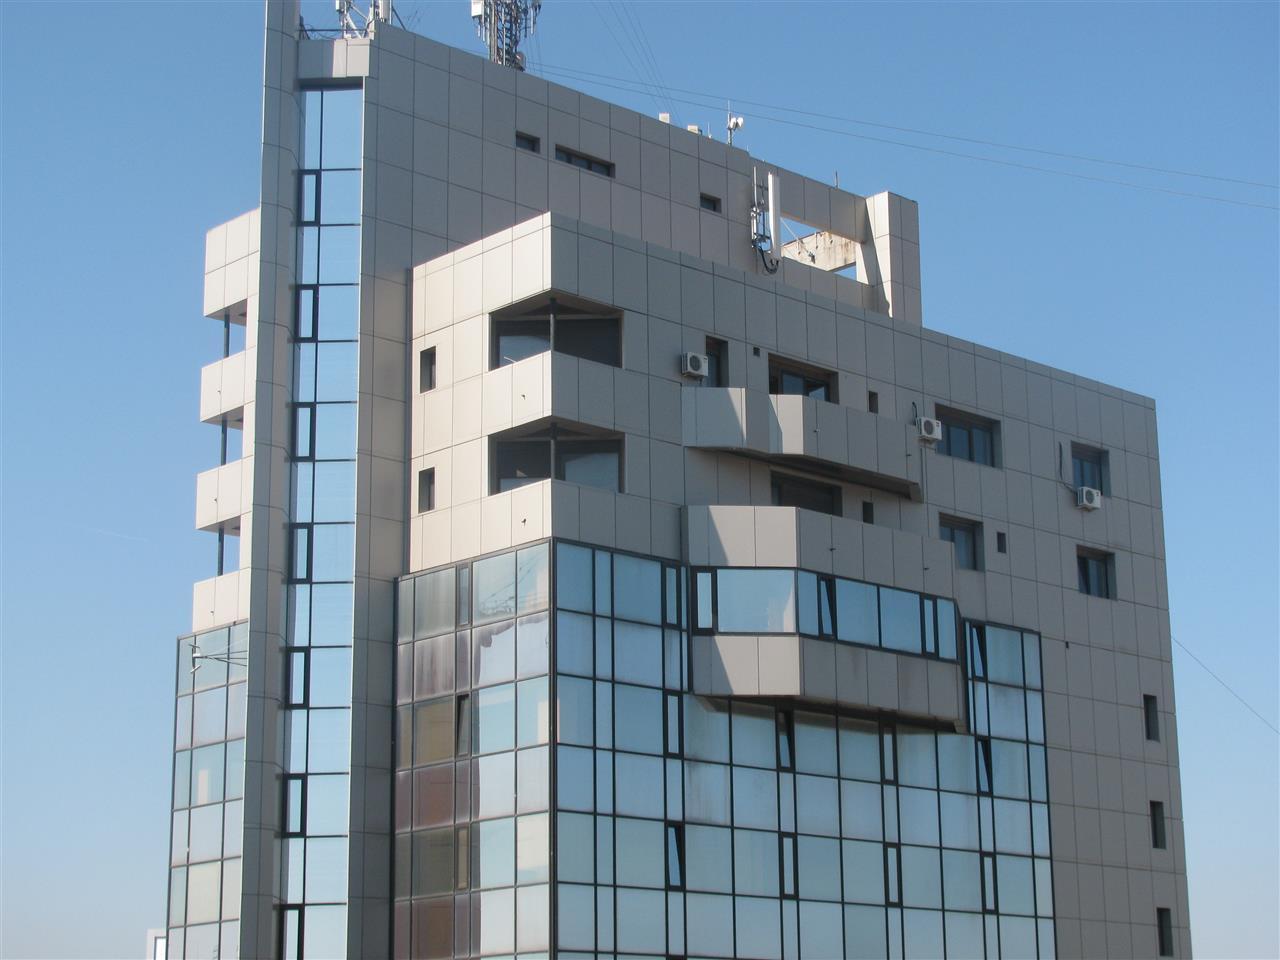 Inchiriere birouri langa metrou Aurel Vlaicu de la 118 mp